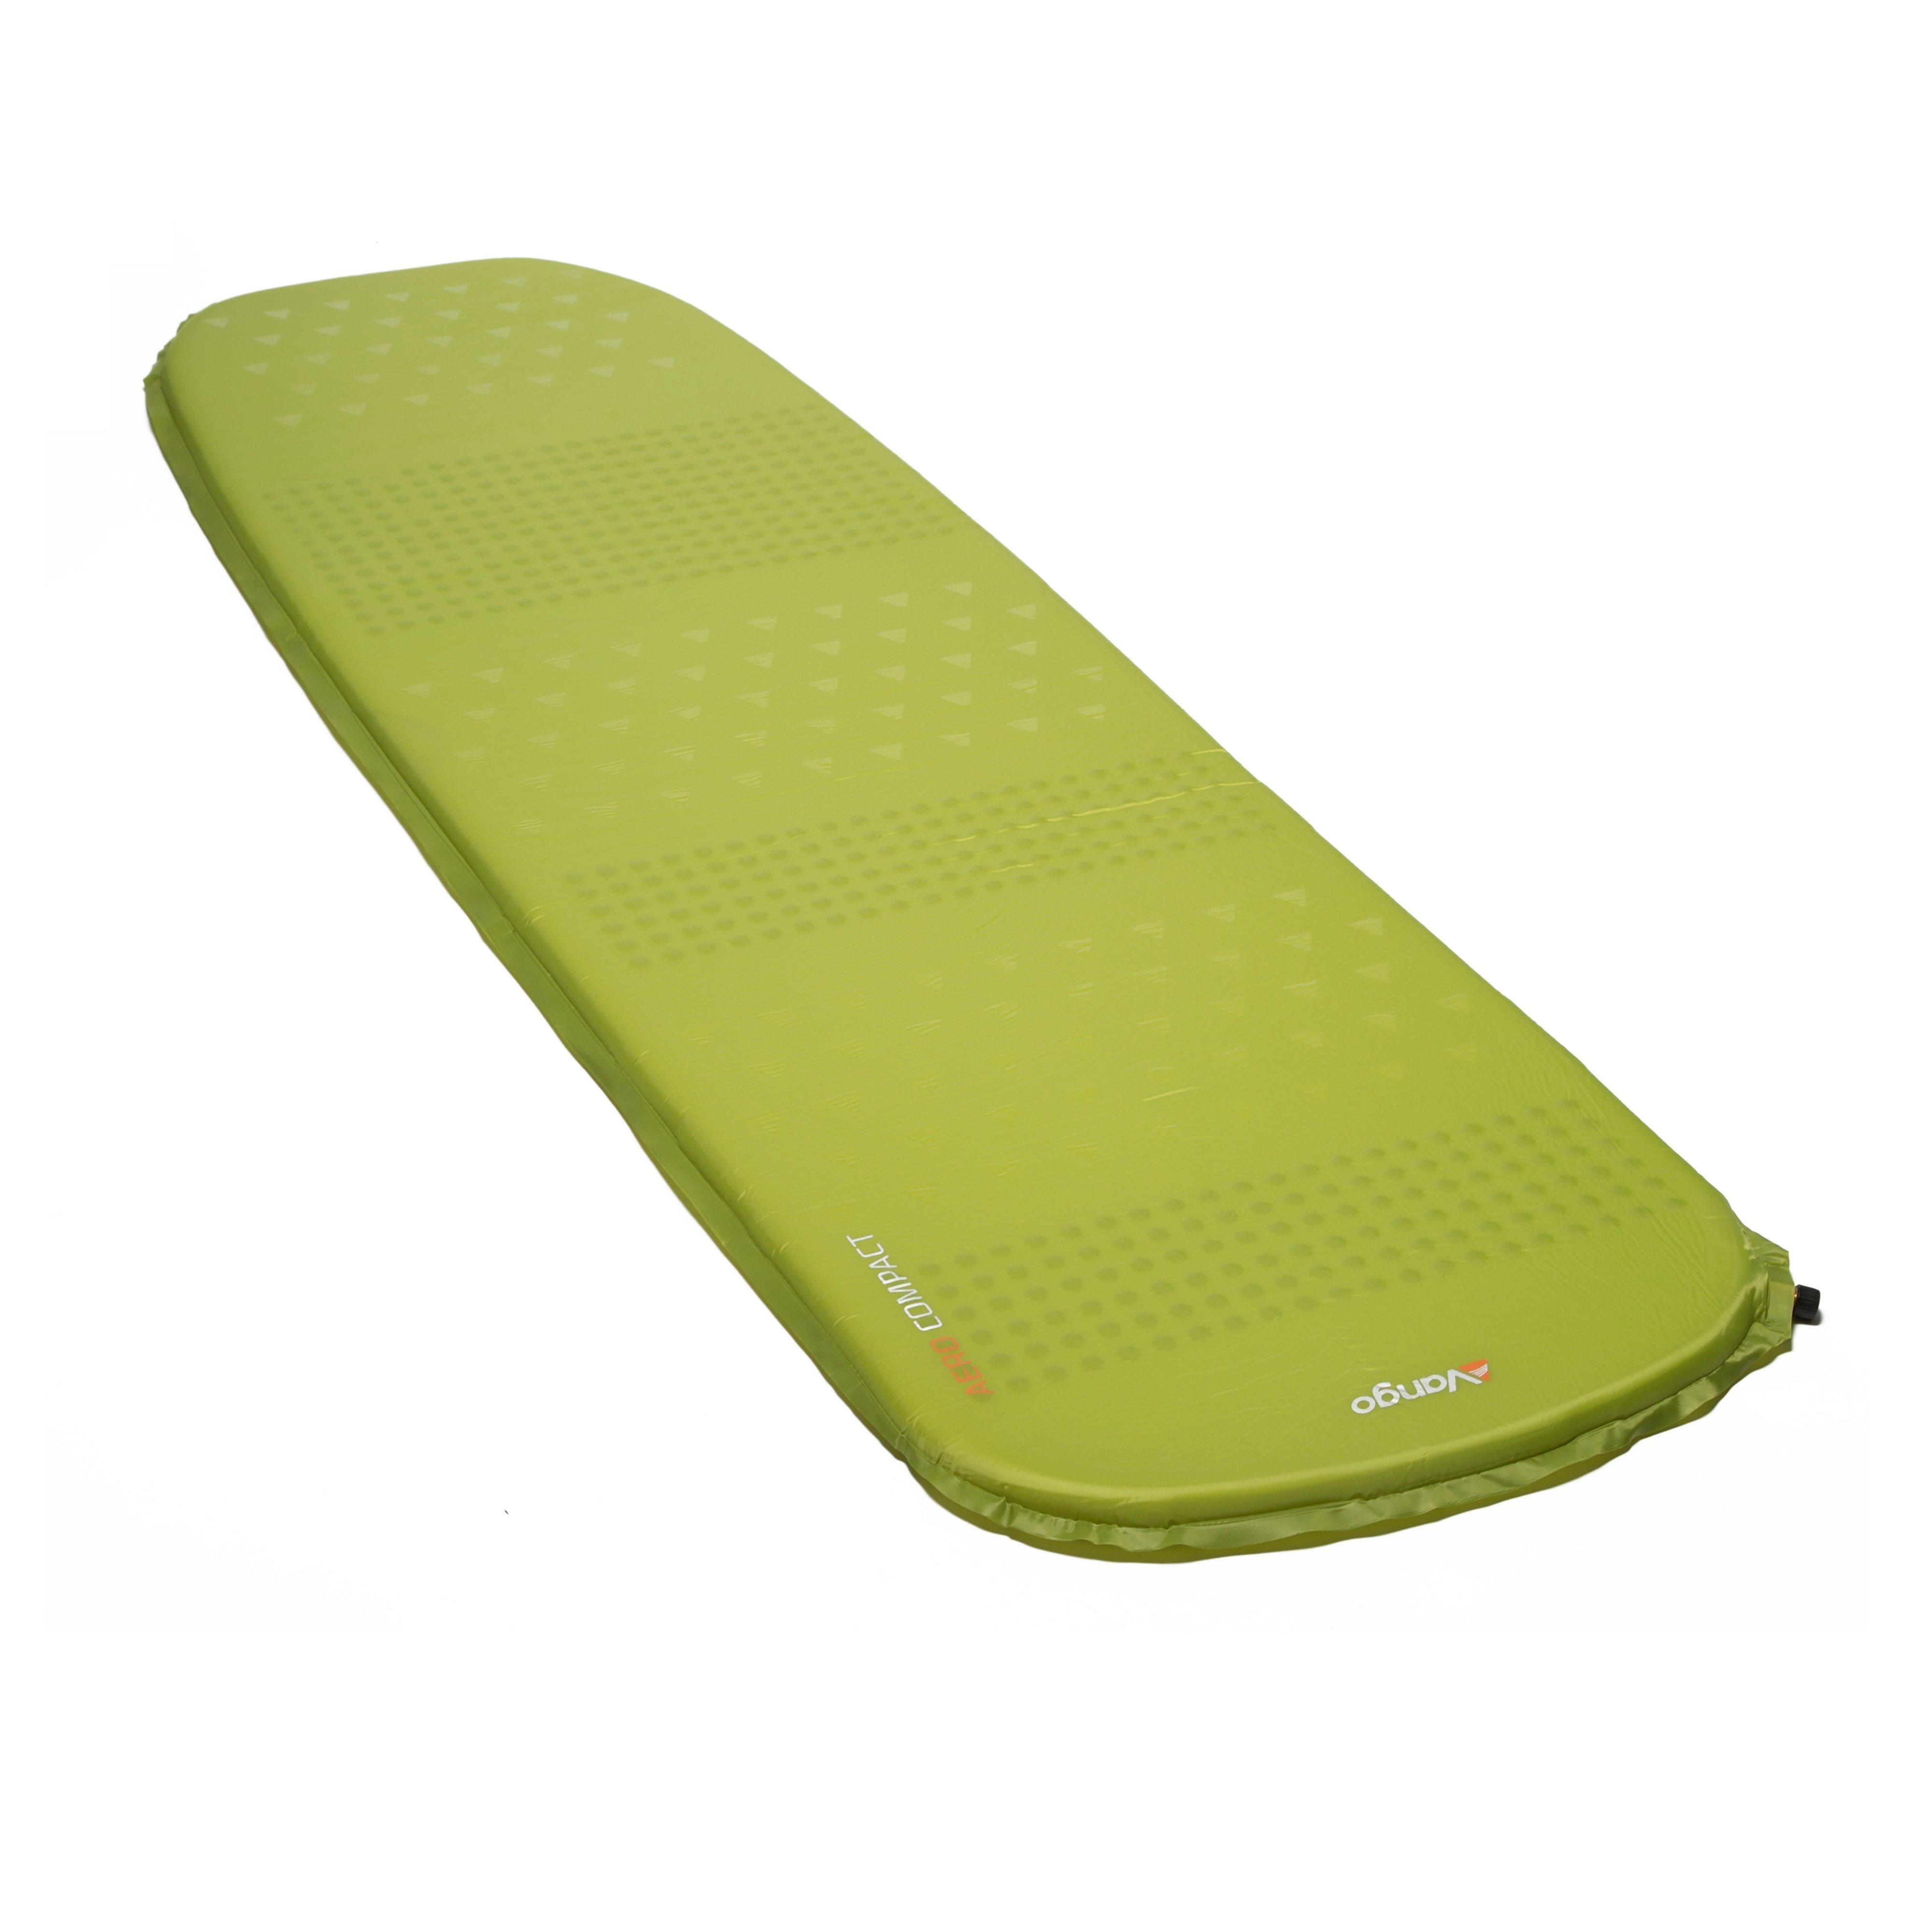 Vango Aero 3cm Compact Sleeping Mat Green Bear Grylls Uk 163 28 00